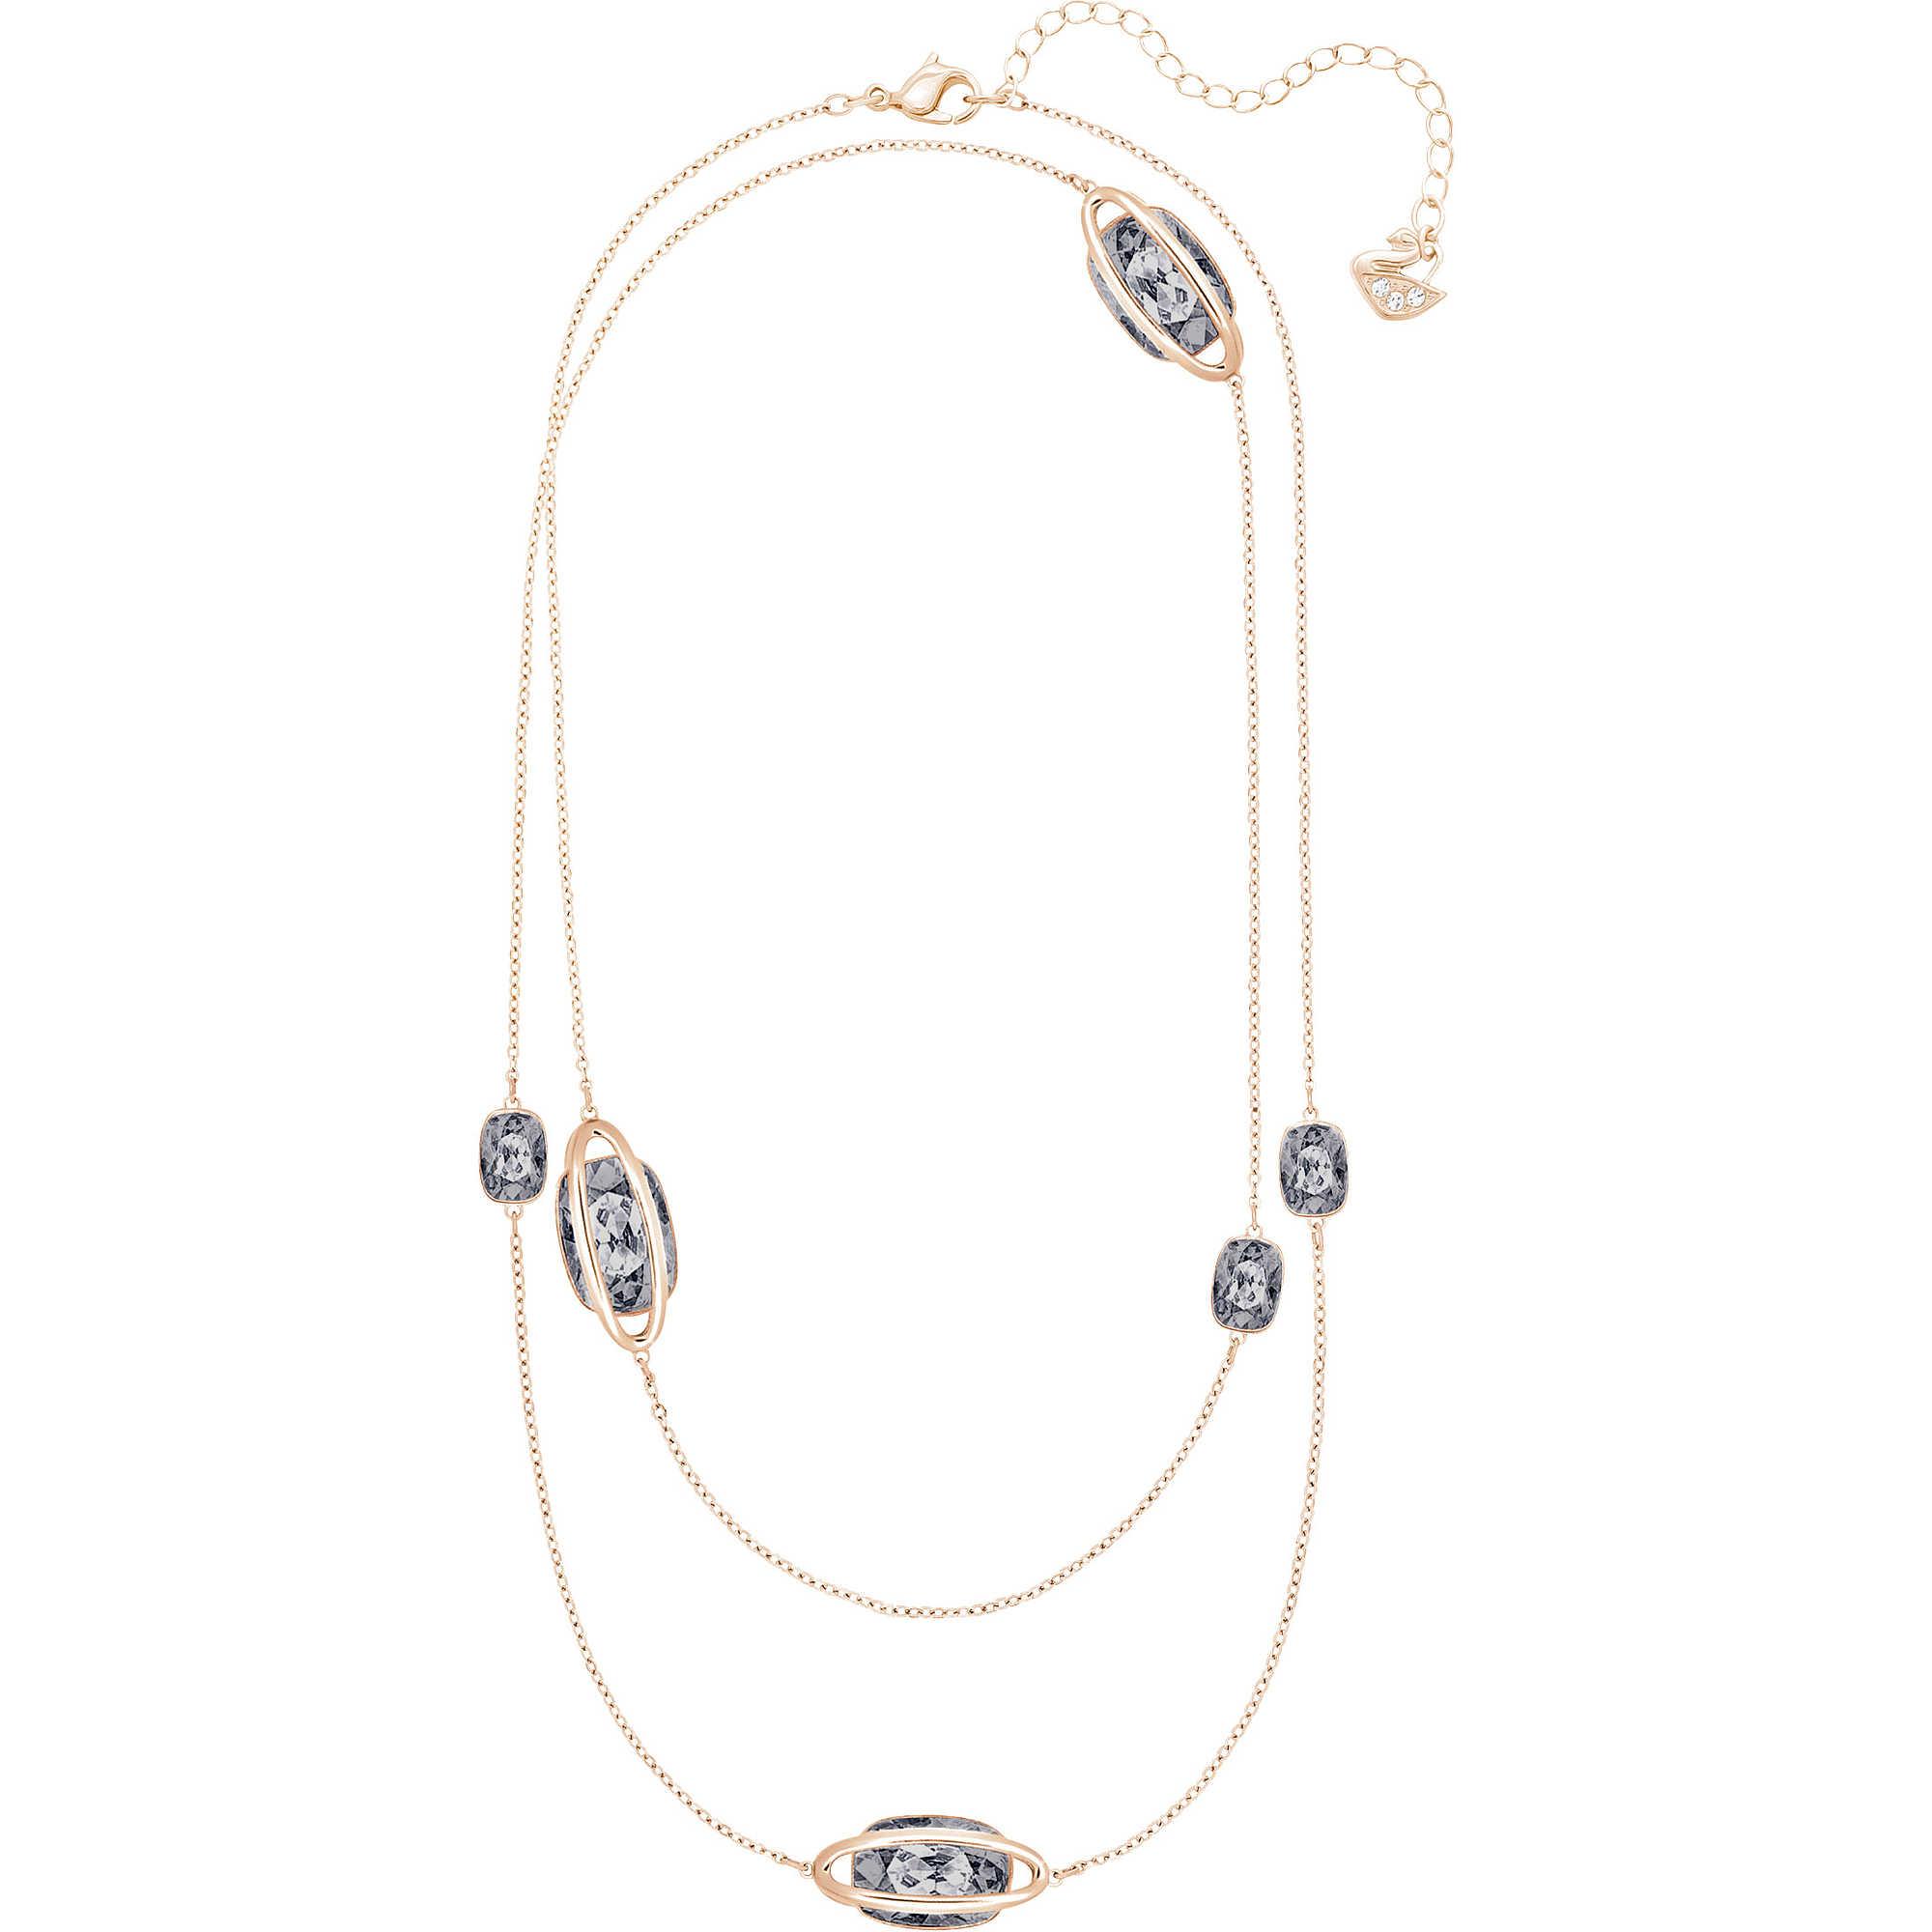 necklace woman jewellery Swarovski Holding 5345169 necklaces Swarovski 59e2f740c